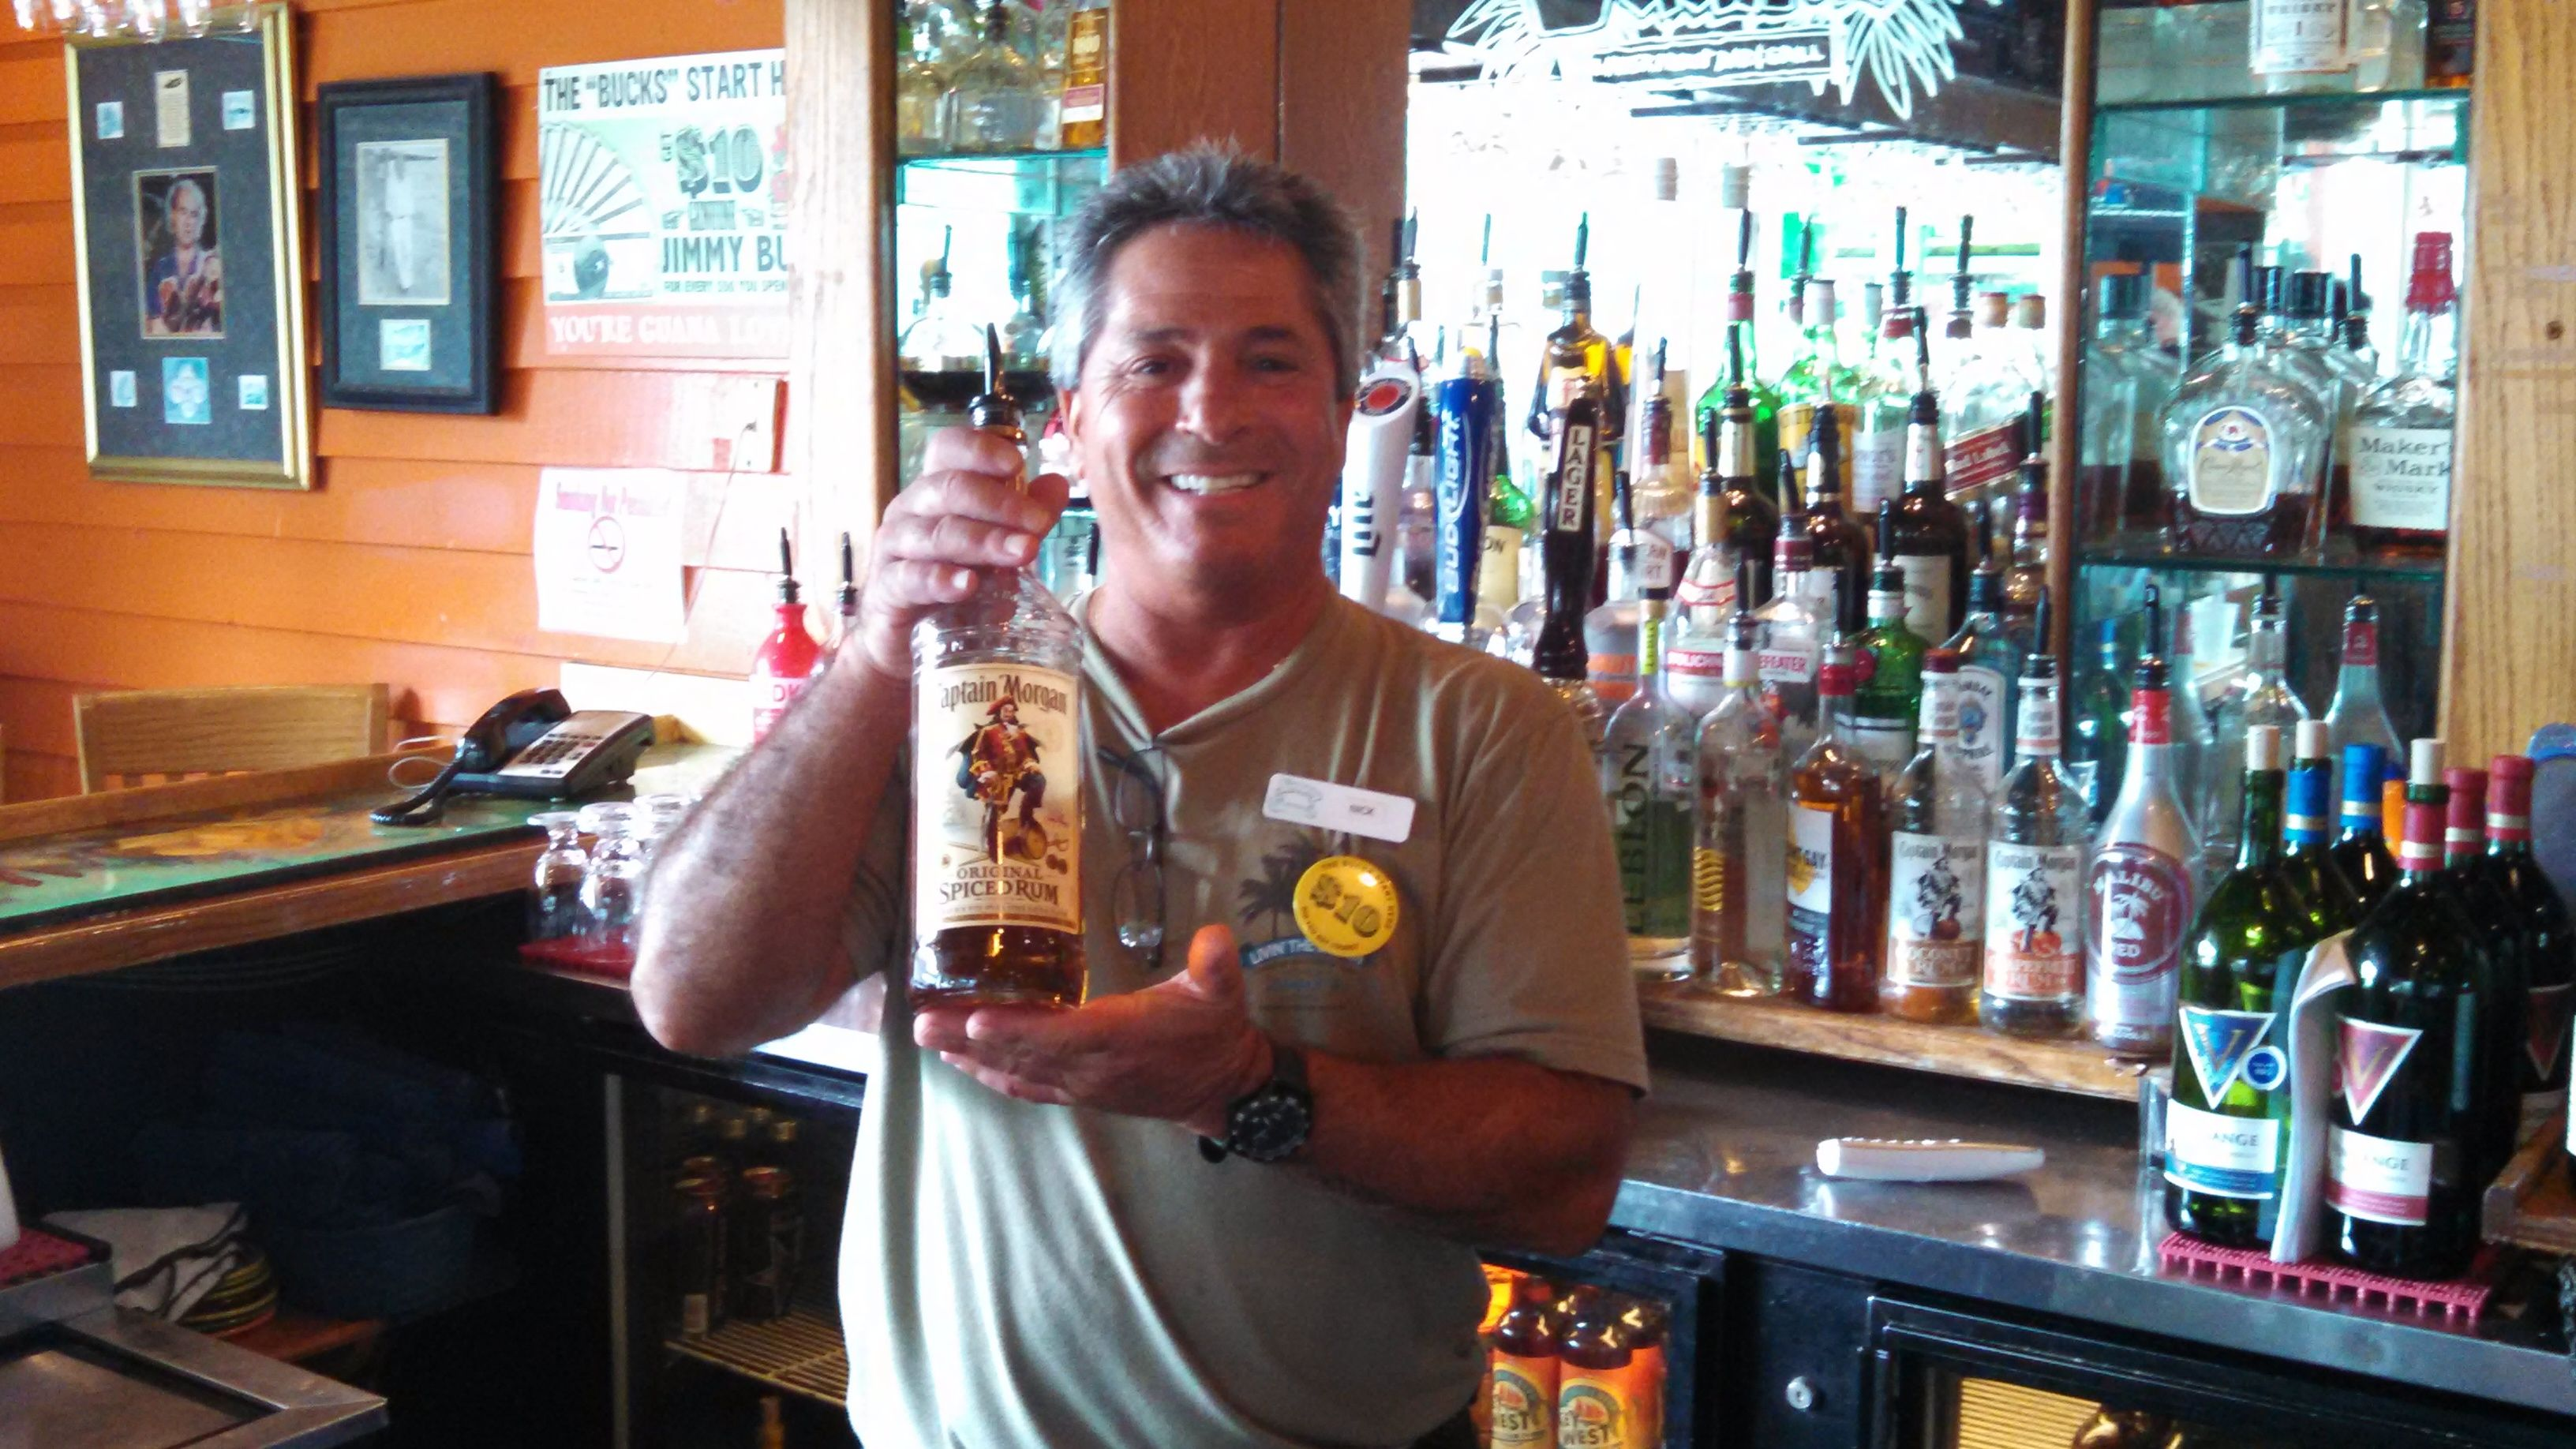 Bar tender and captain bartender photo tour photo